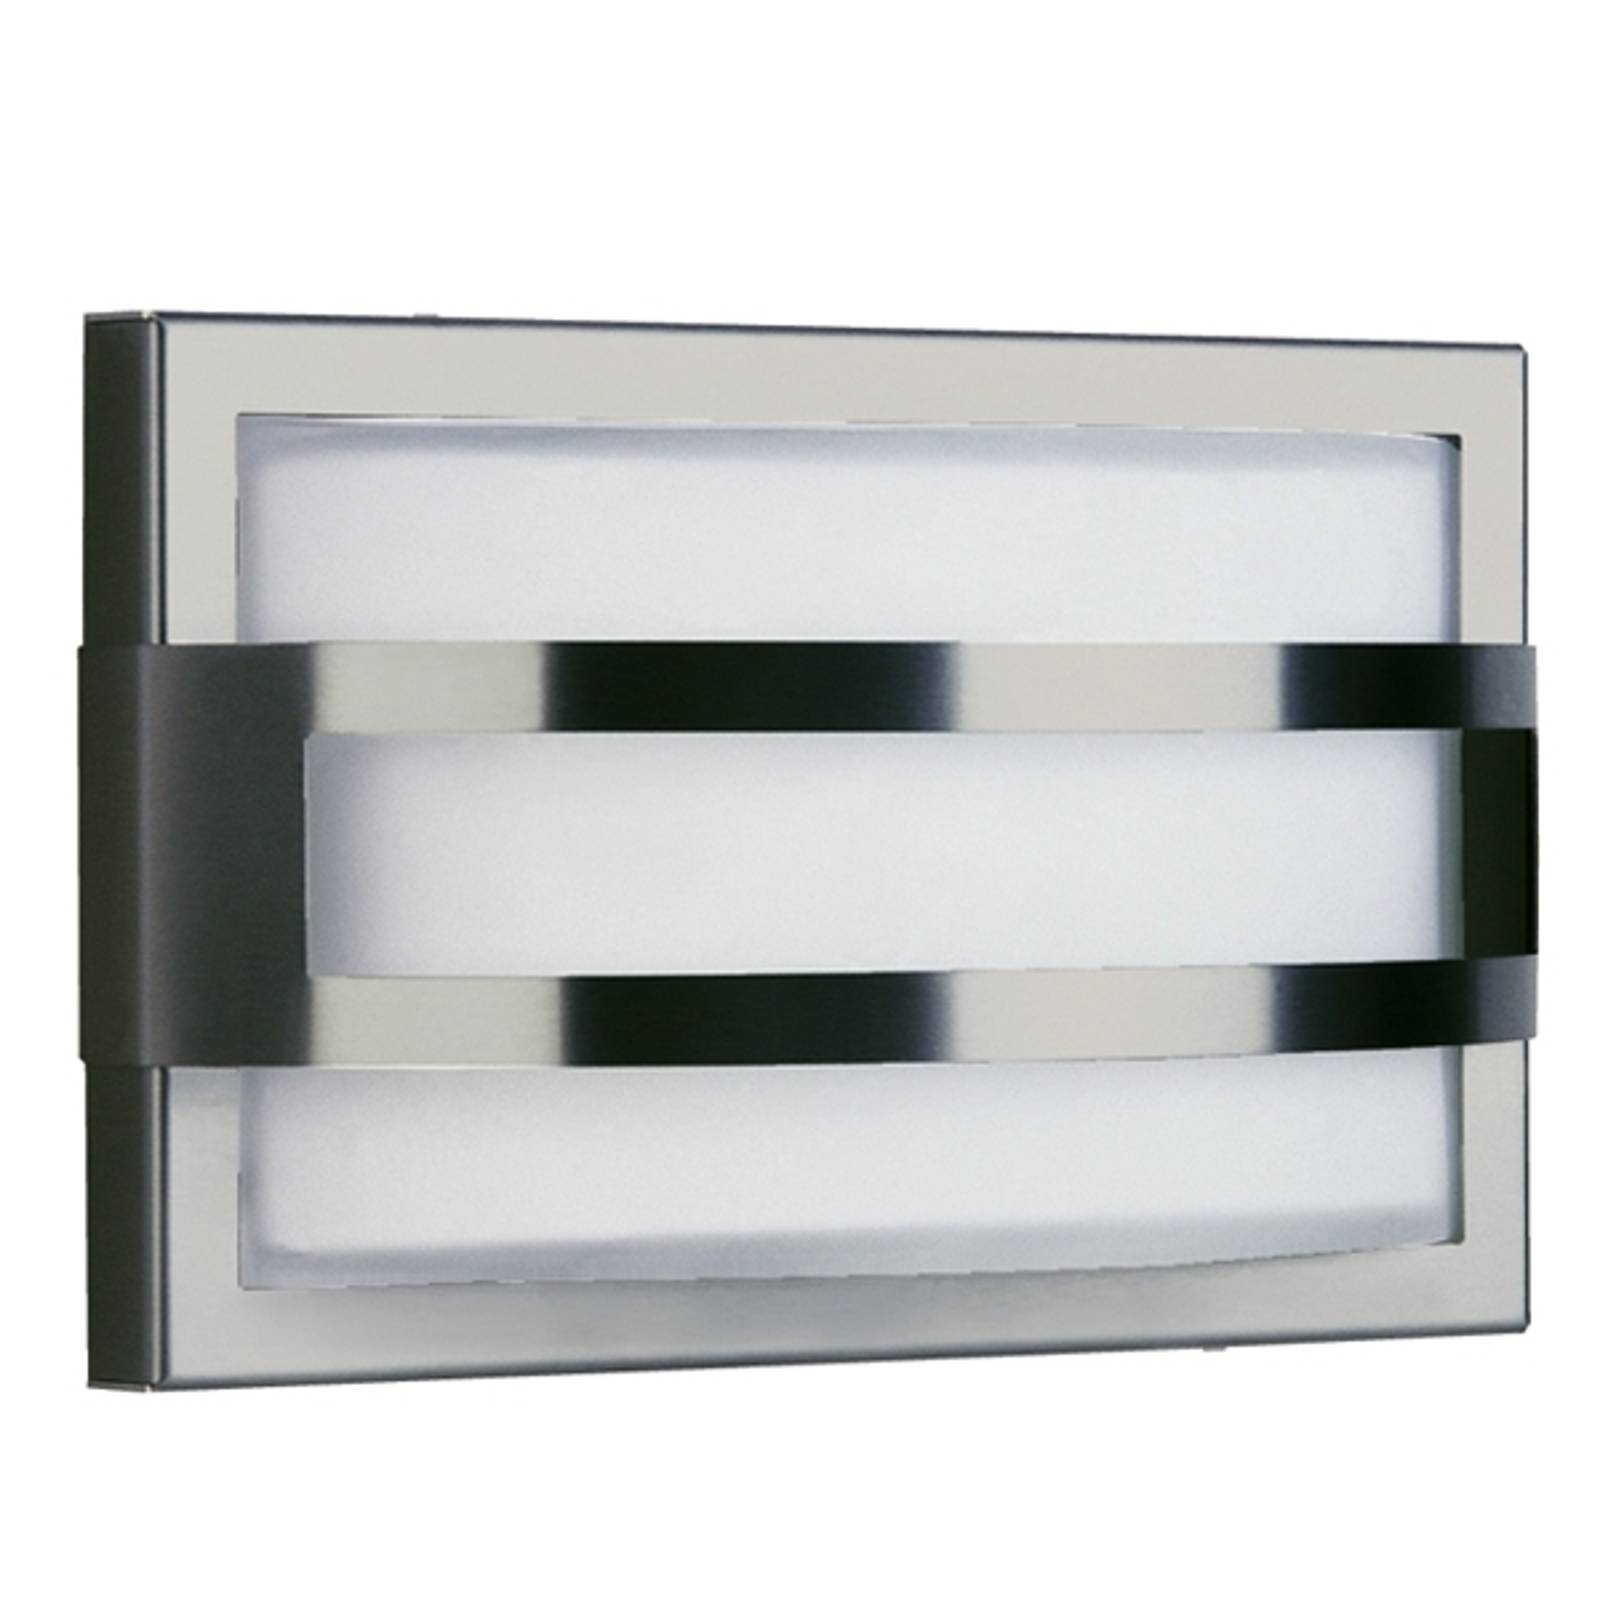 Veelzijdige buitenwandlamp 433